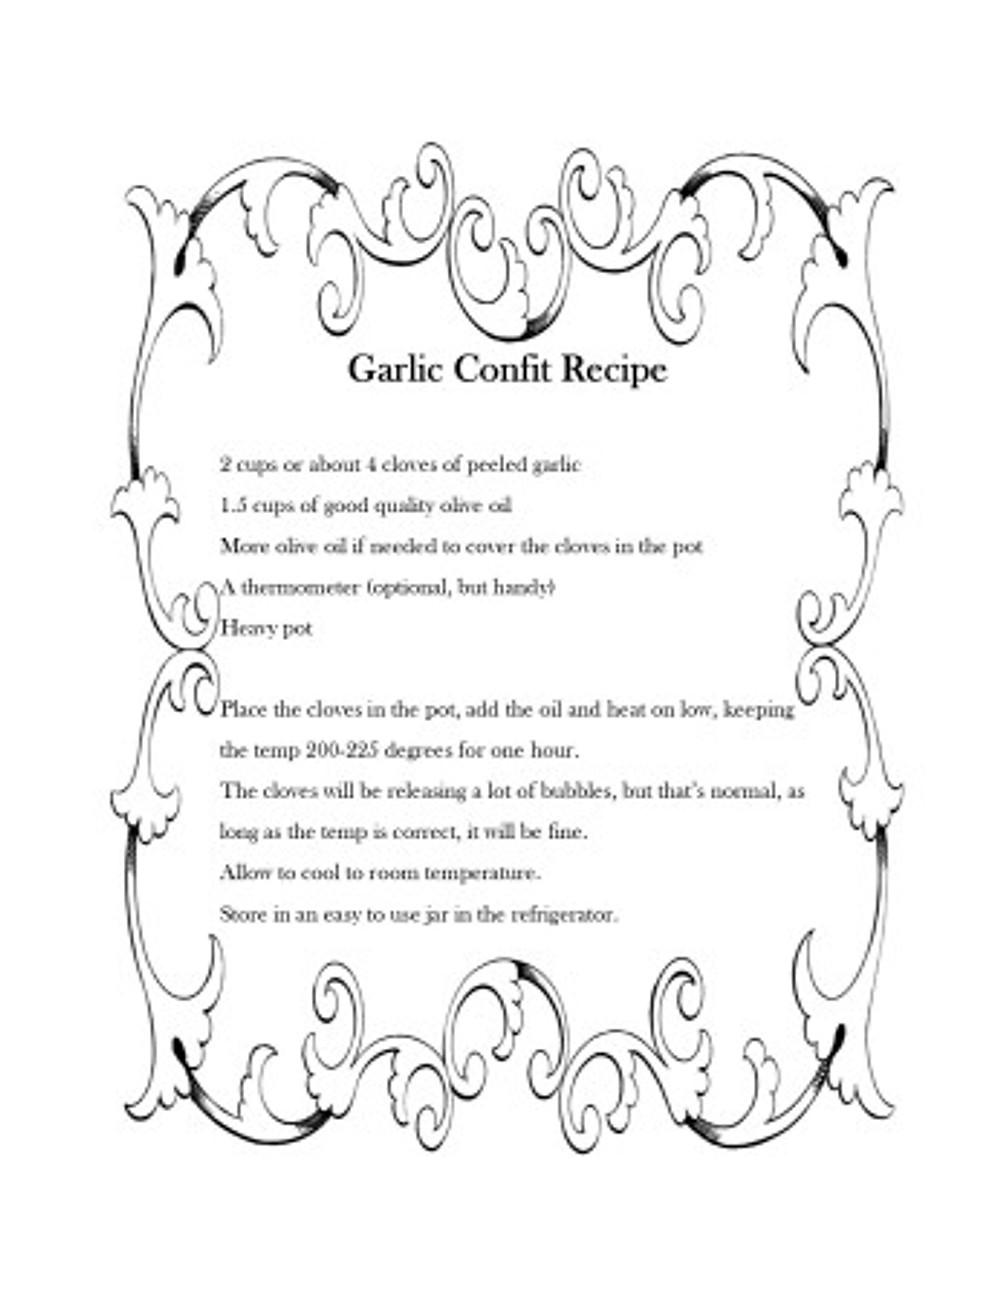 Garlic Confict Recipe